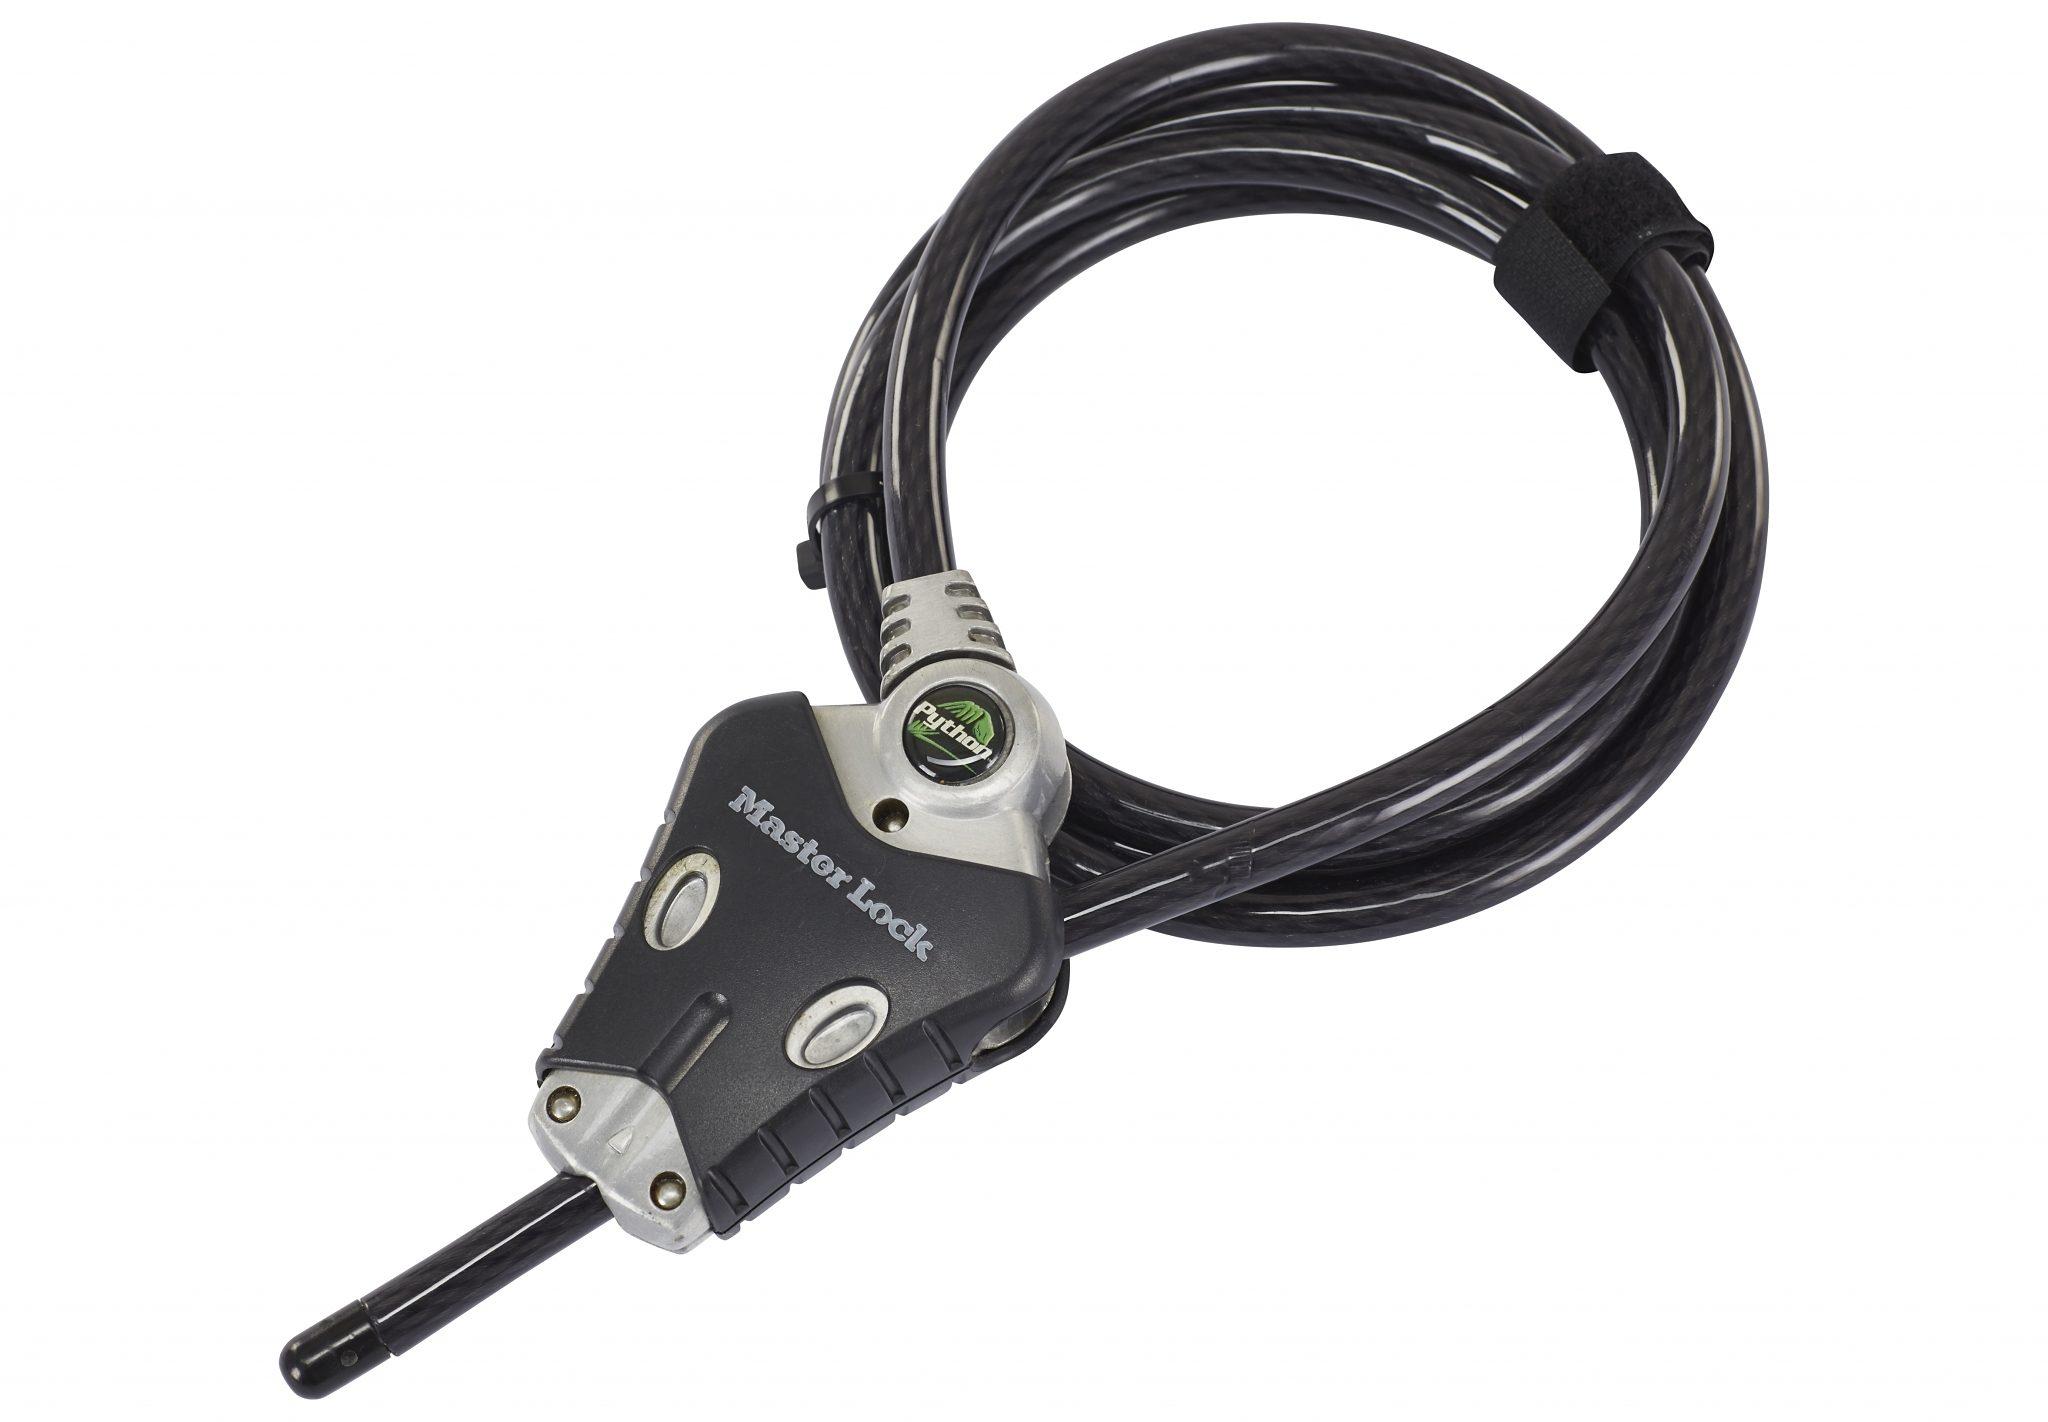 Masterlock Fahrradschloss »Python Lock 8428 Kabelschloss 10 mm x 1.800 mm«